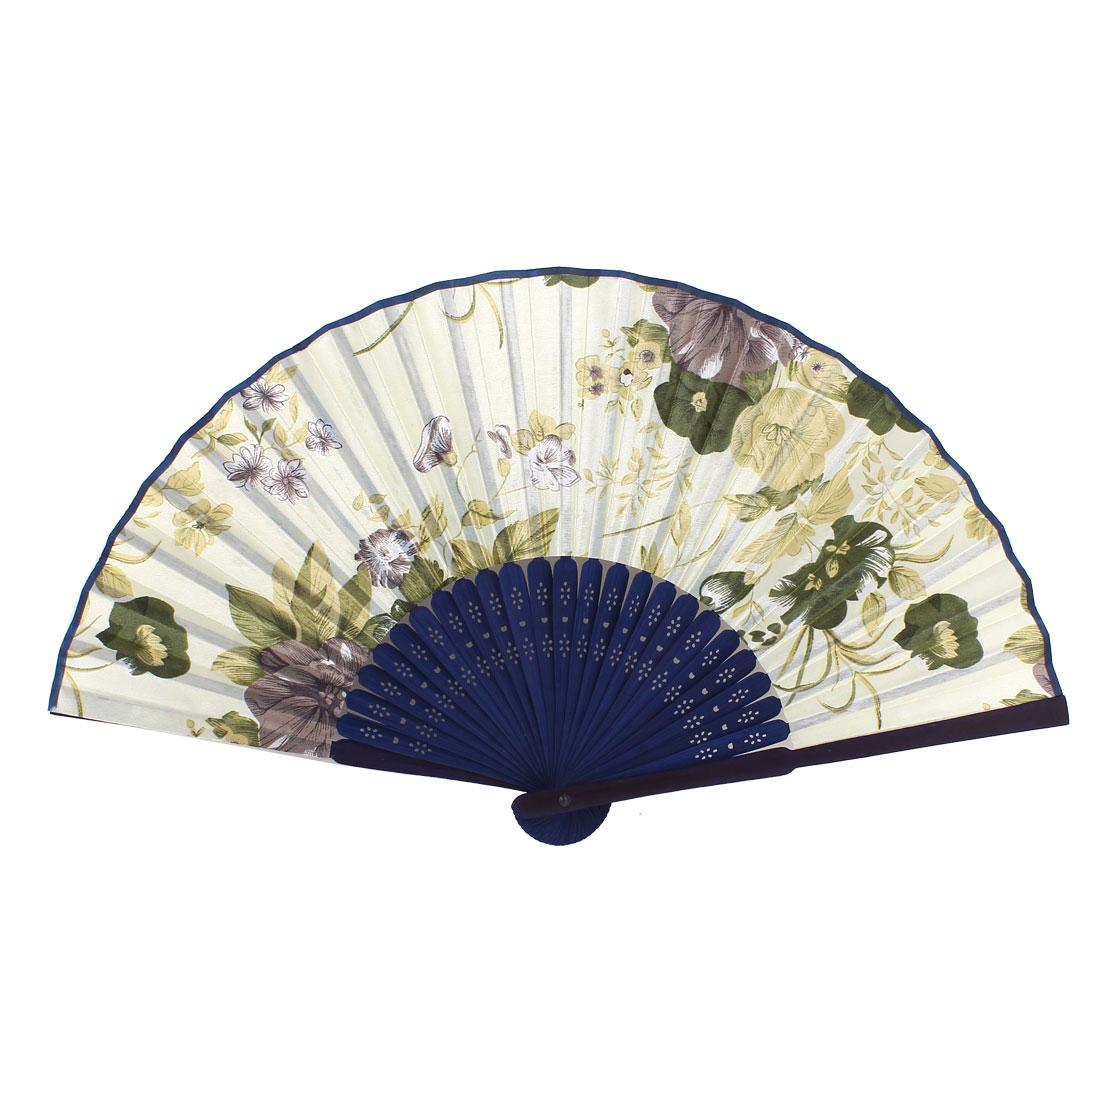 Houseware Bamboo Hollow Out Ribs Flower Print Summer Hand Fan White